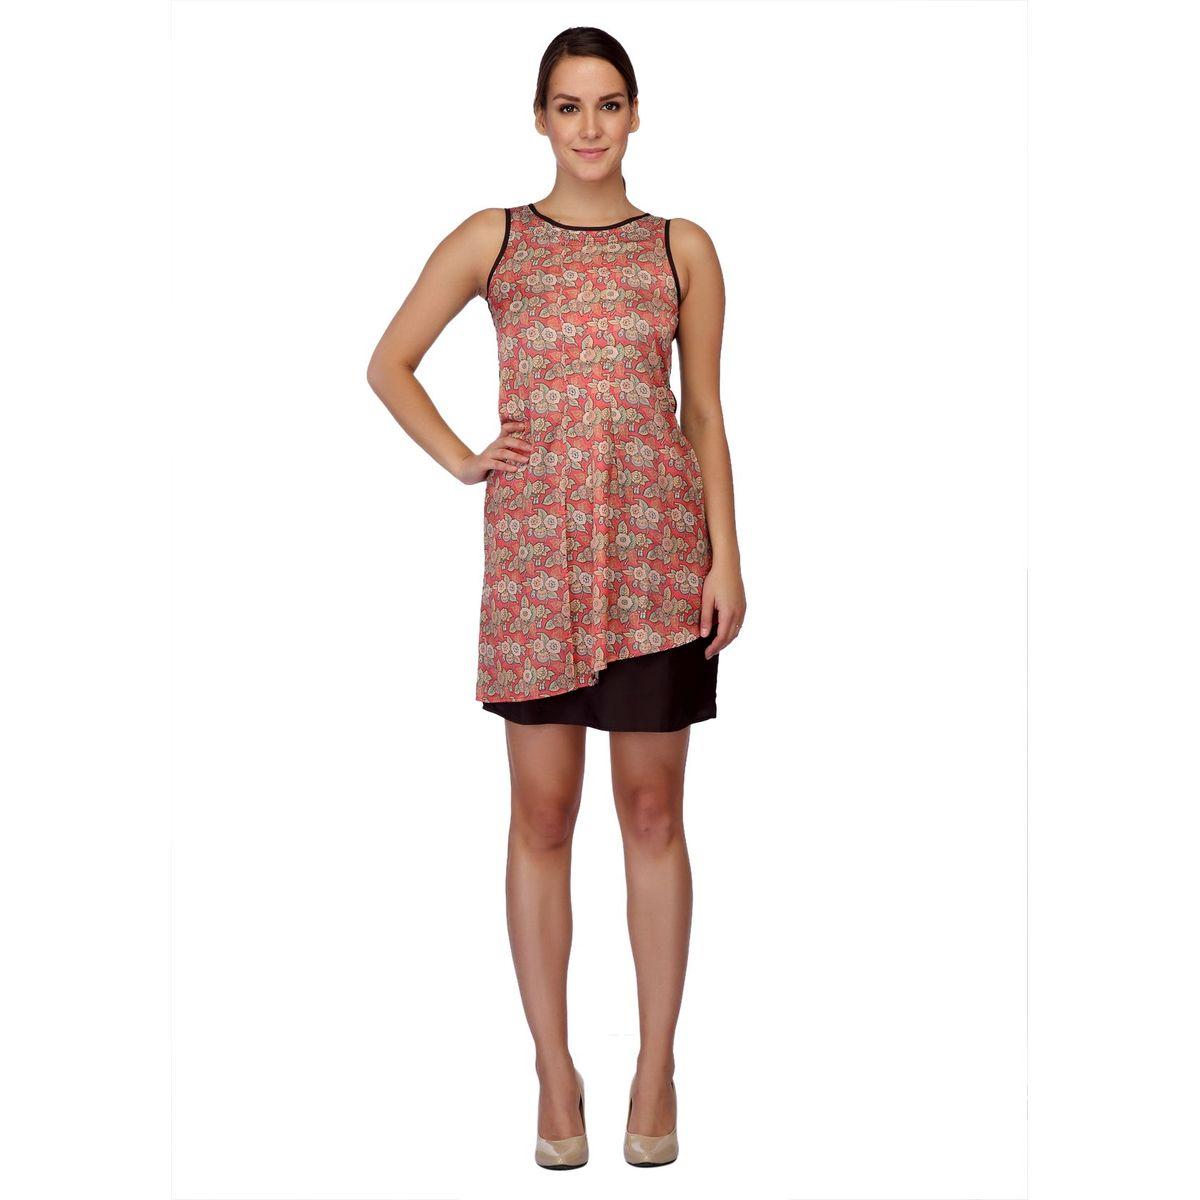 DAHLIA FLORAL PRINT DRESS